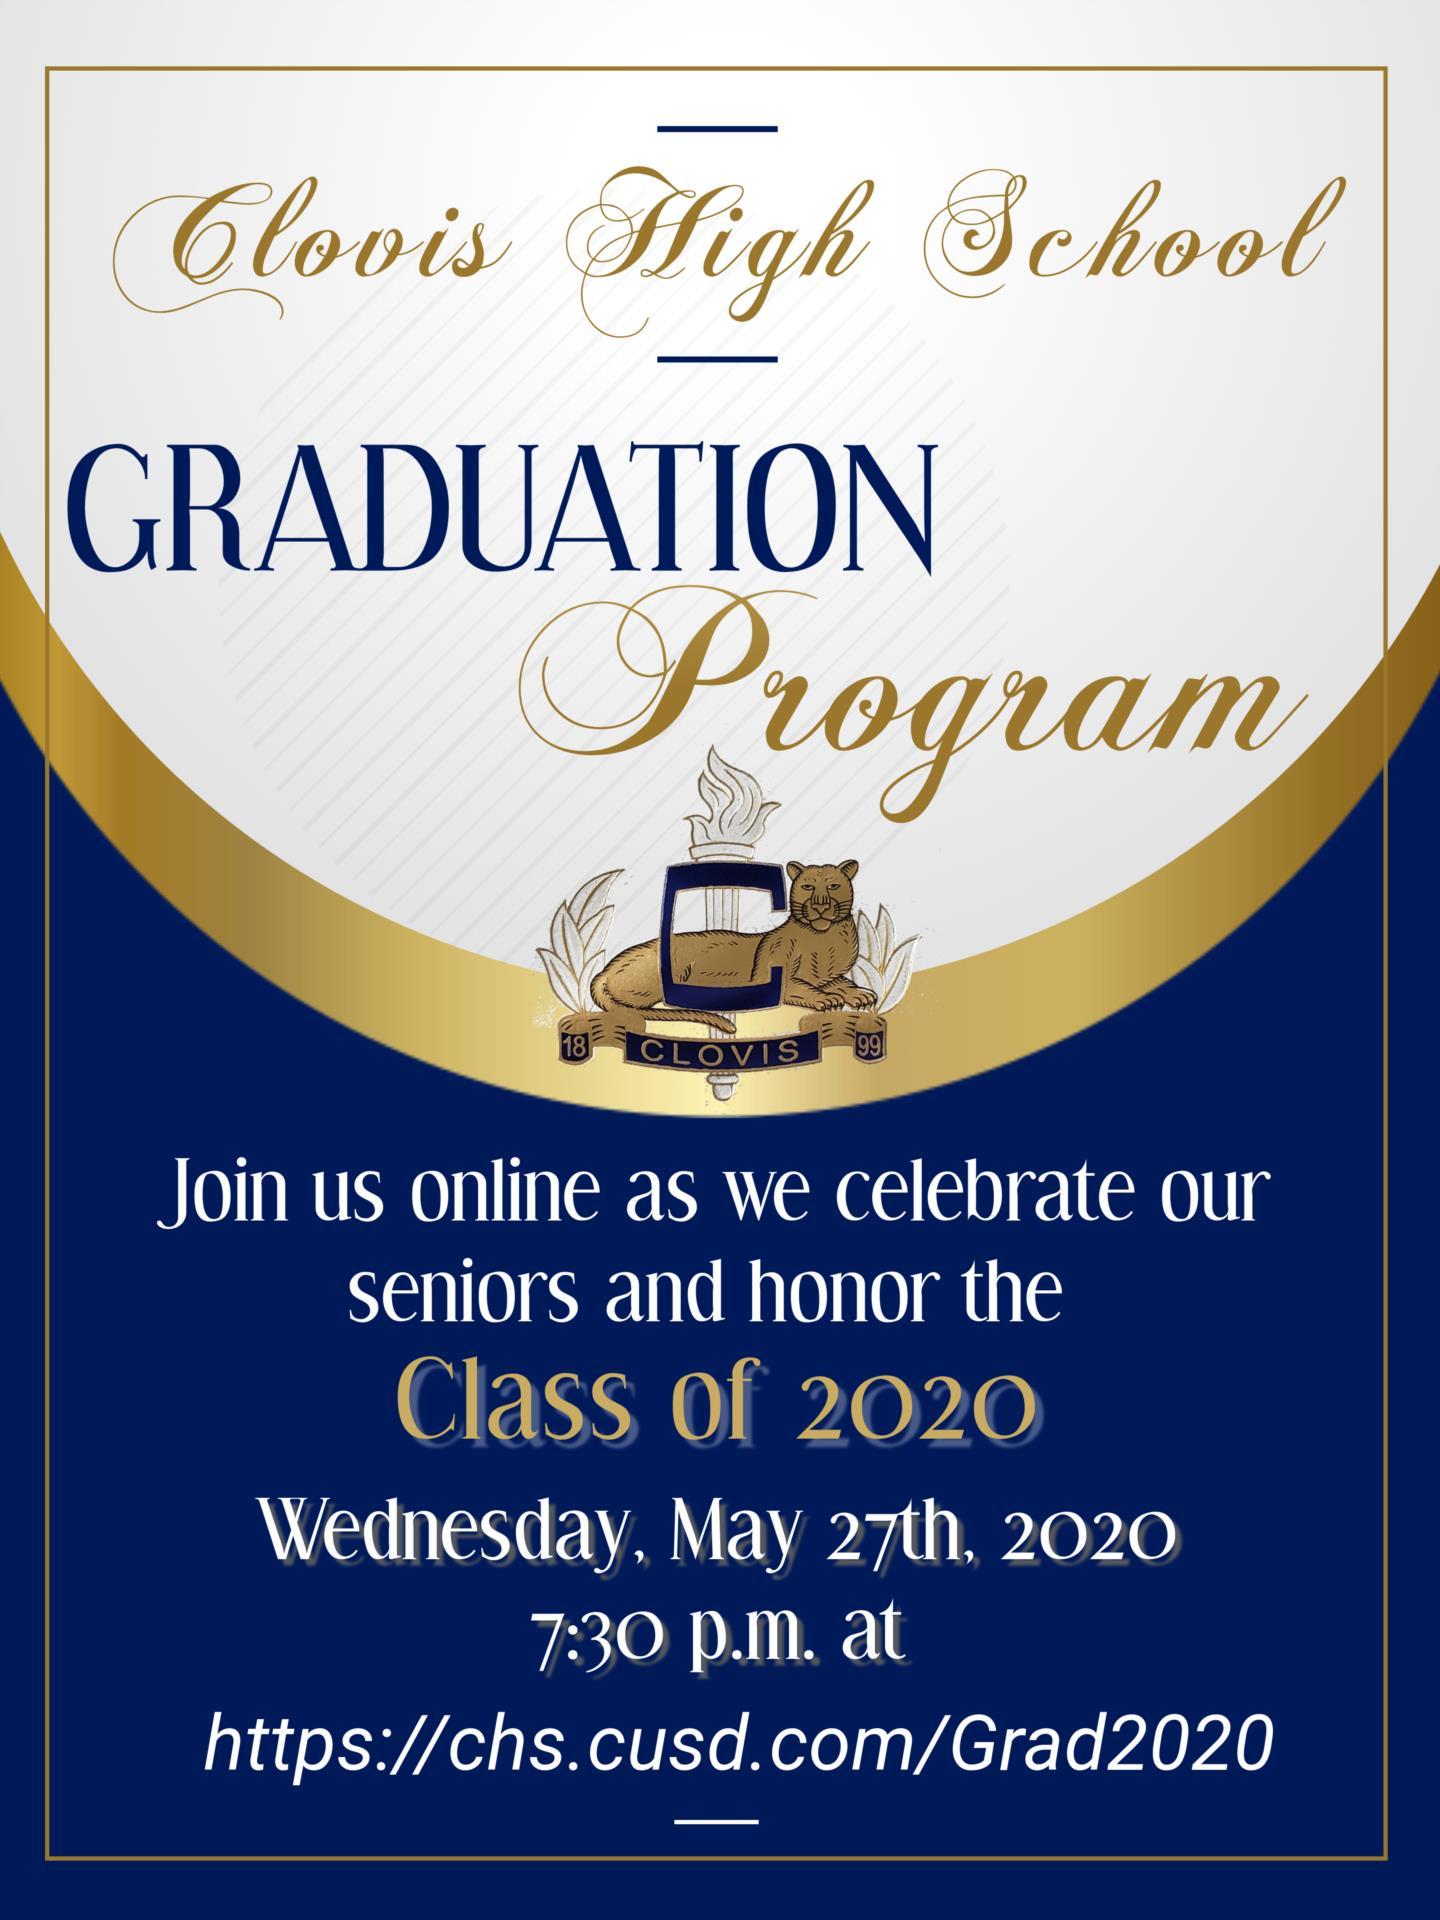 Online Graduation Program Invite